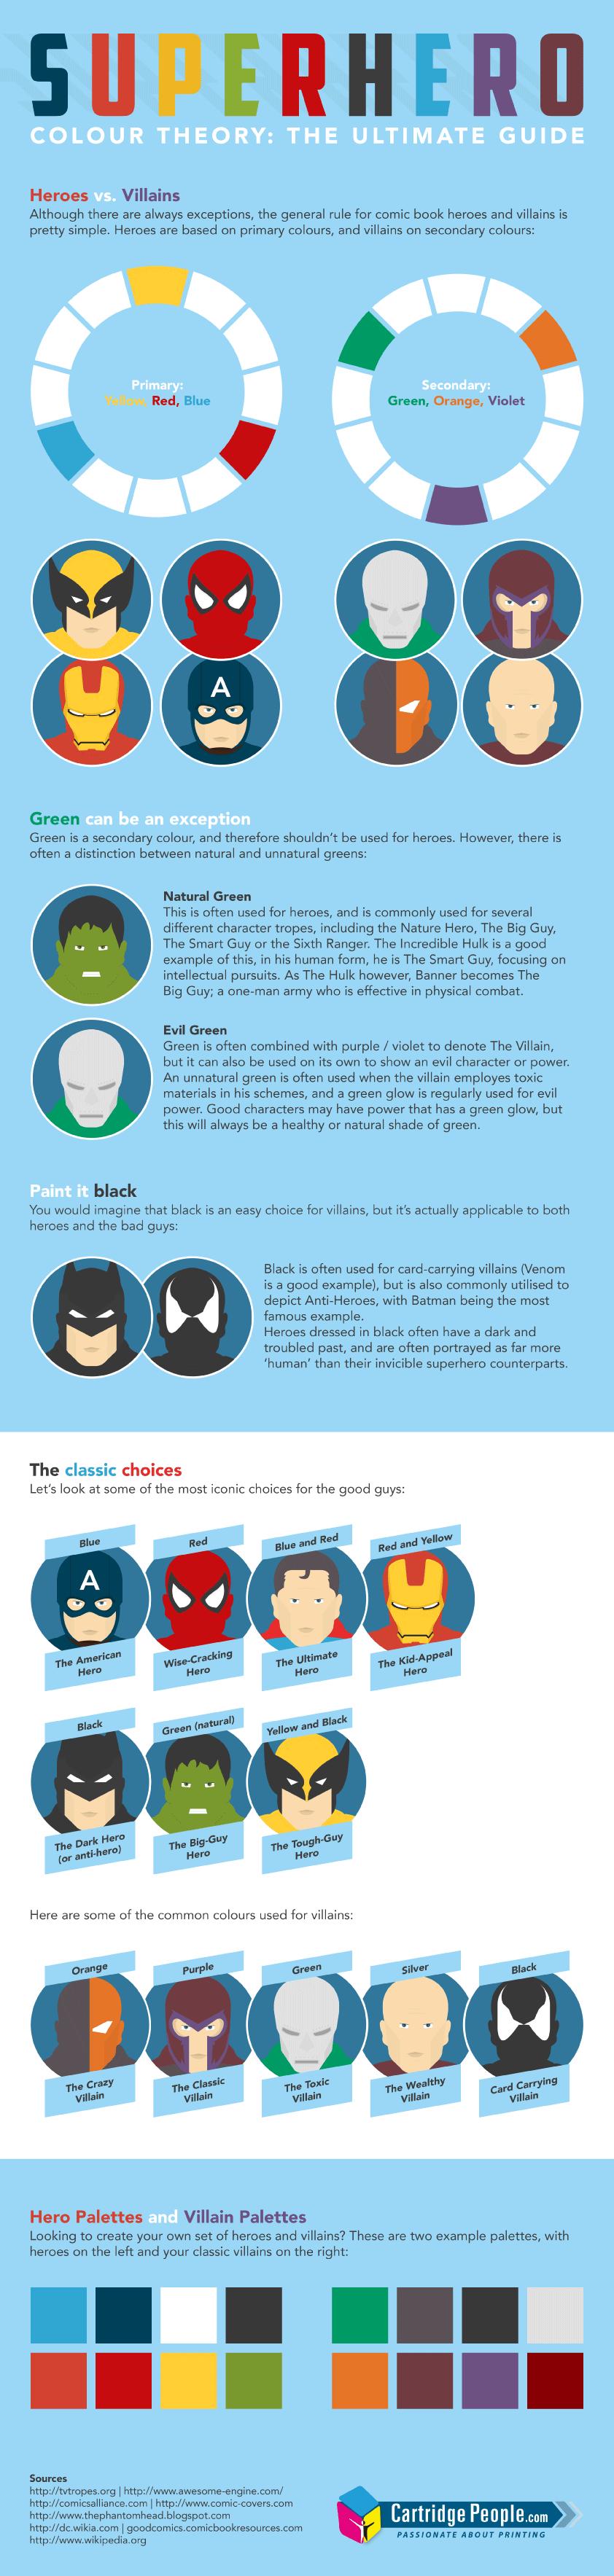 Superhero Colour Theory